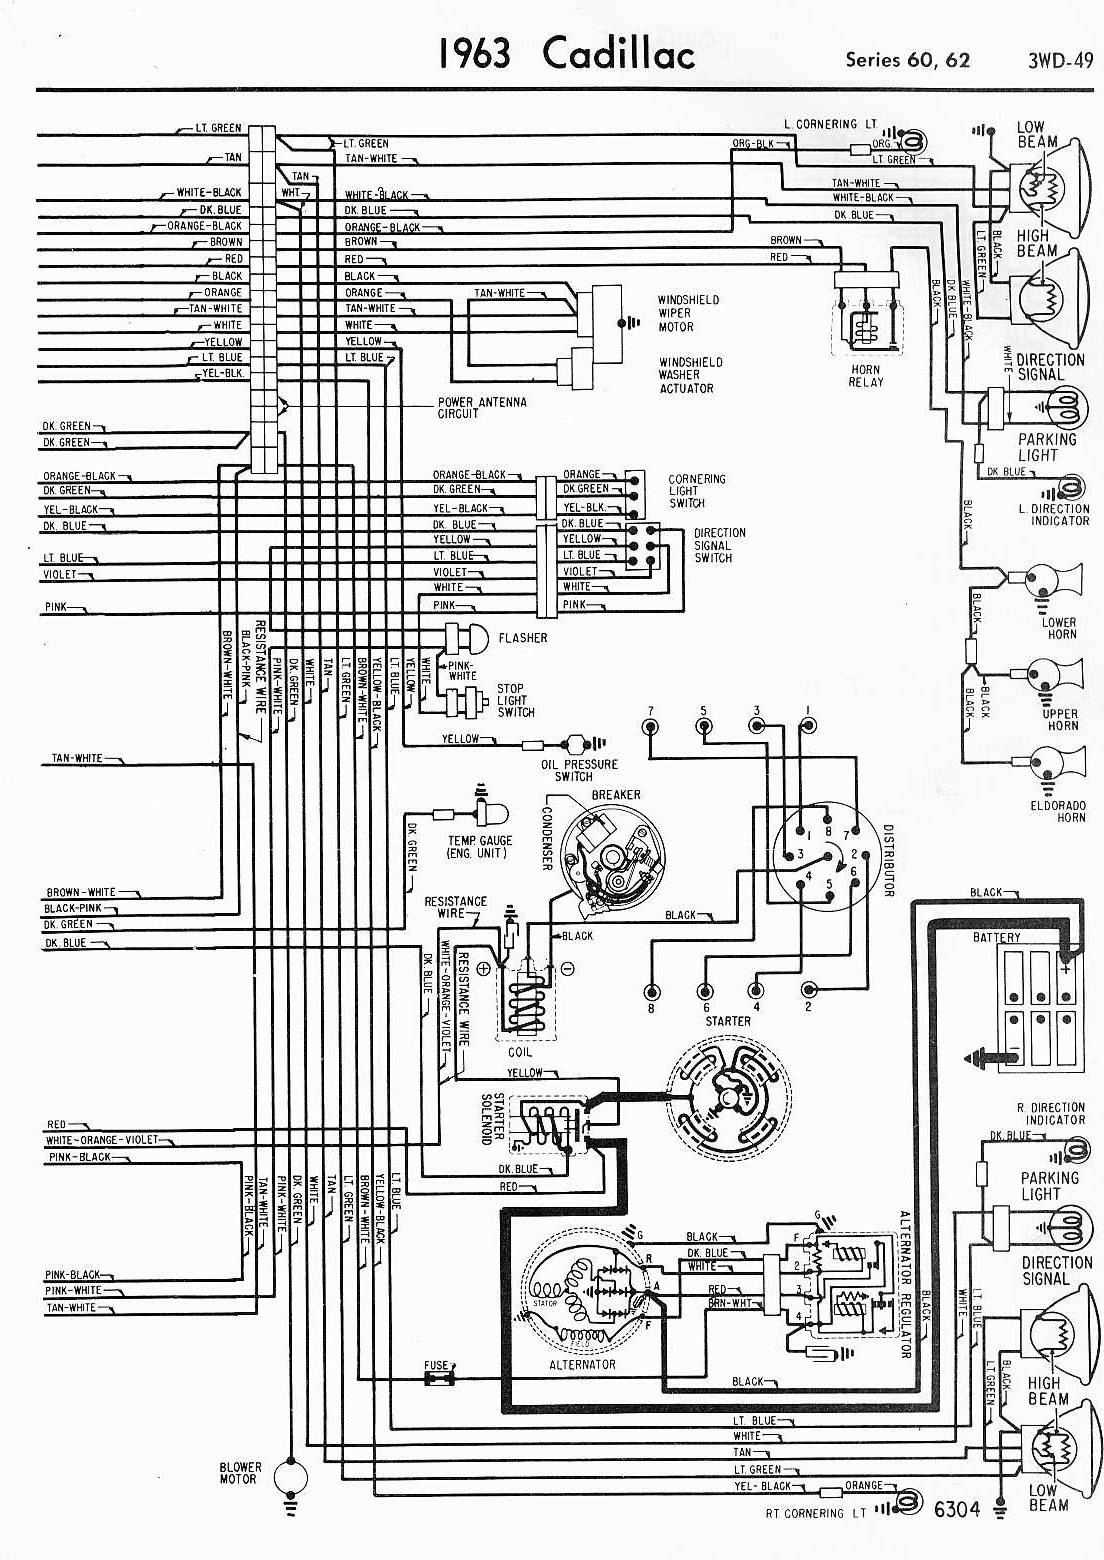 Windshield Wiper Motor Wiring Diagram For 1984 Cadillac Eldorado Yamaha Tw200 Parts Free Vehicle Diagrams U2022 Rh Addone Tw